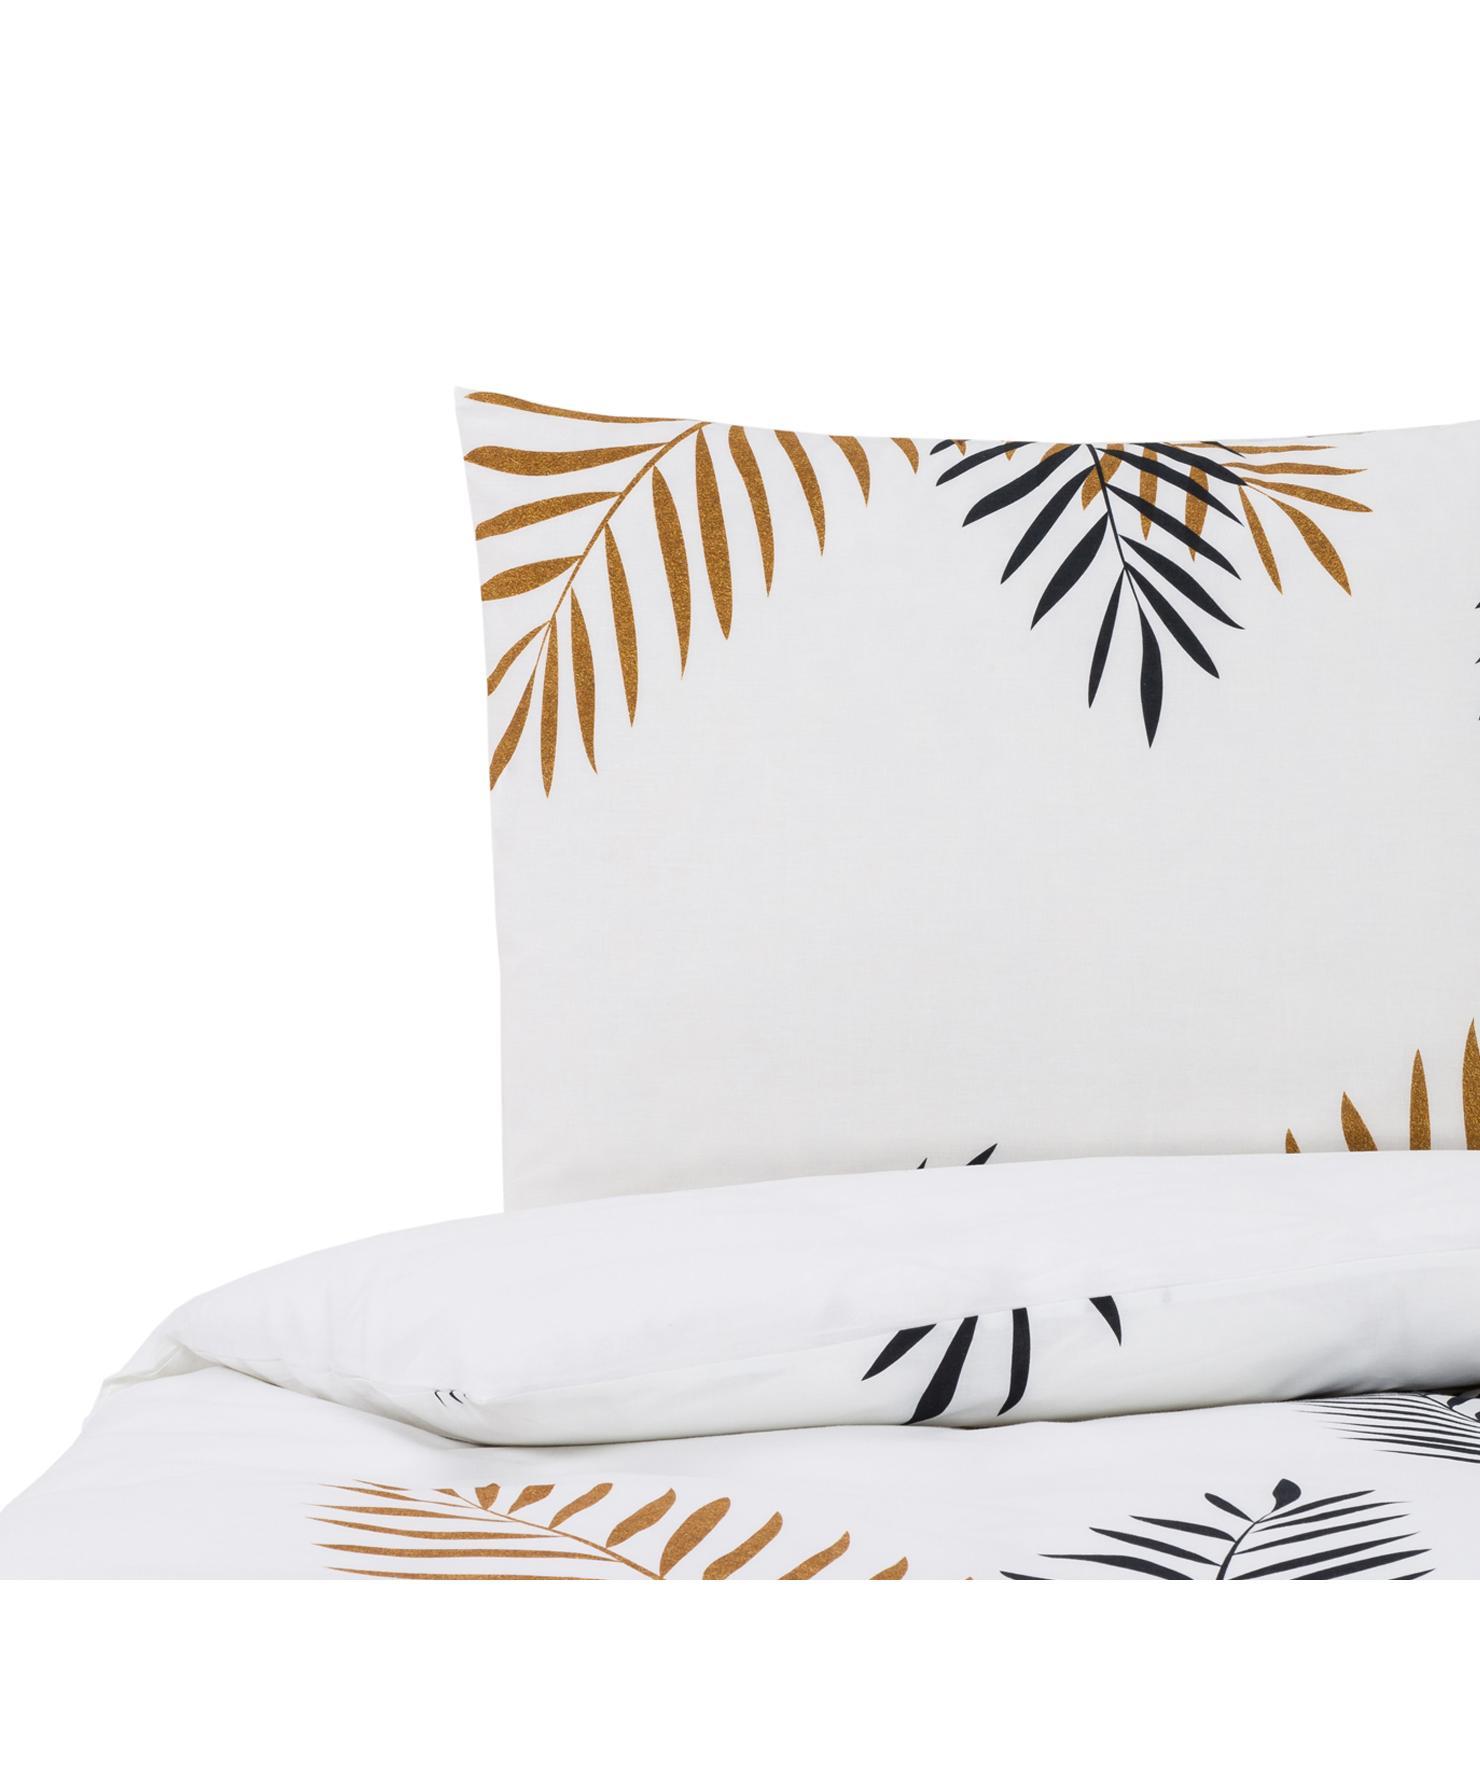 Dubbelzijdig beddengoed Foliage, Katoen, Zwart, okergeel, wit, 140 x 200 cm